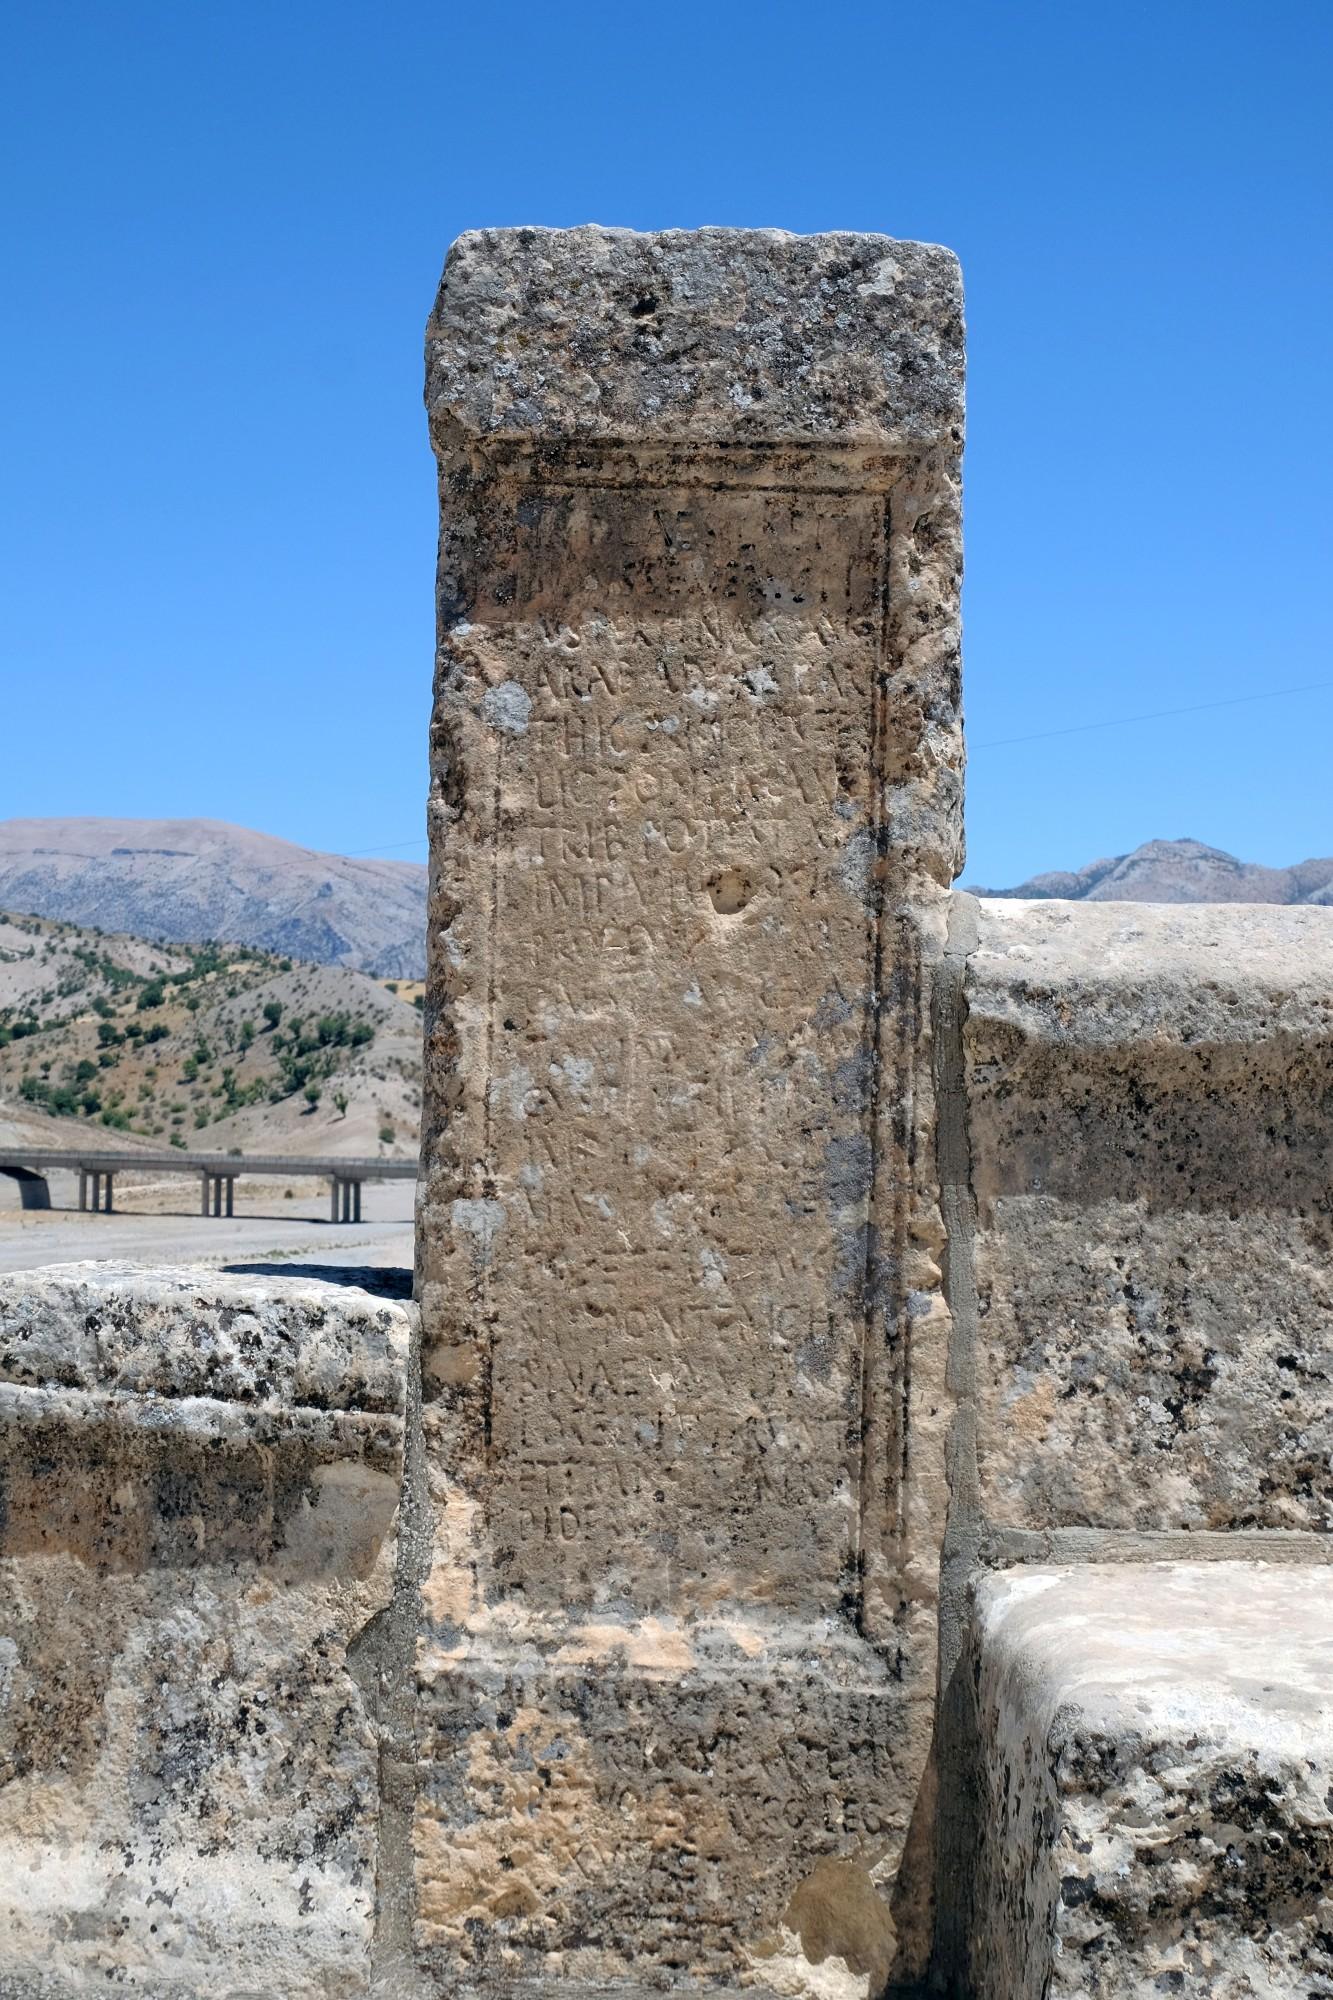 Inskrypcja na moście Septymiusza Sewera - wersja druga